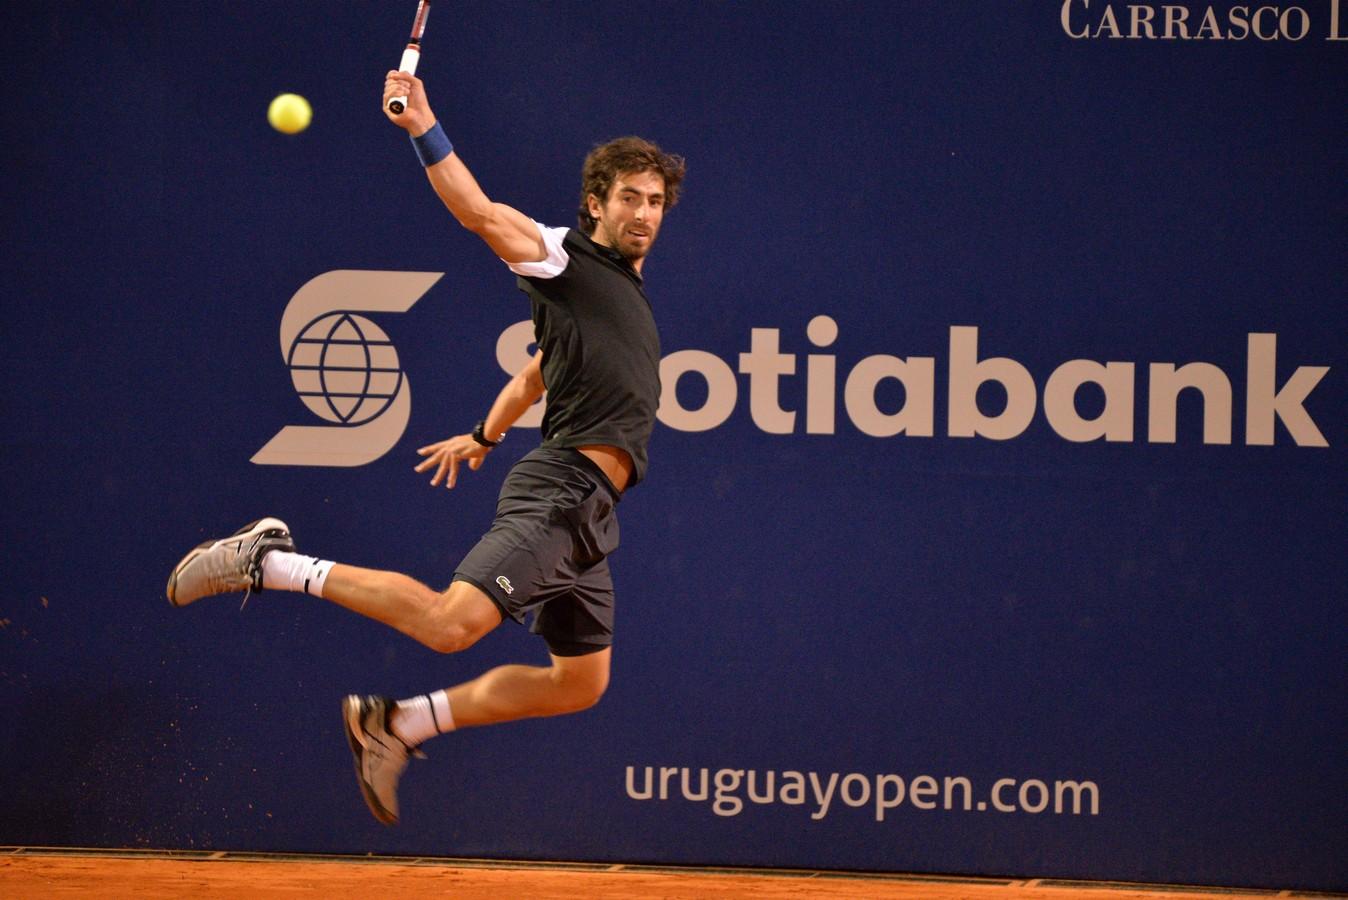 Foto: Uruguay Open